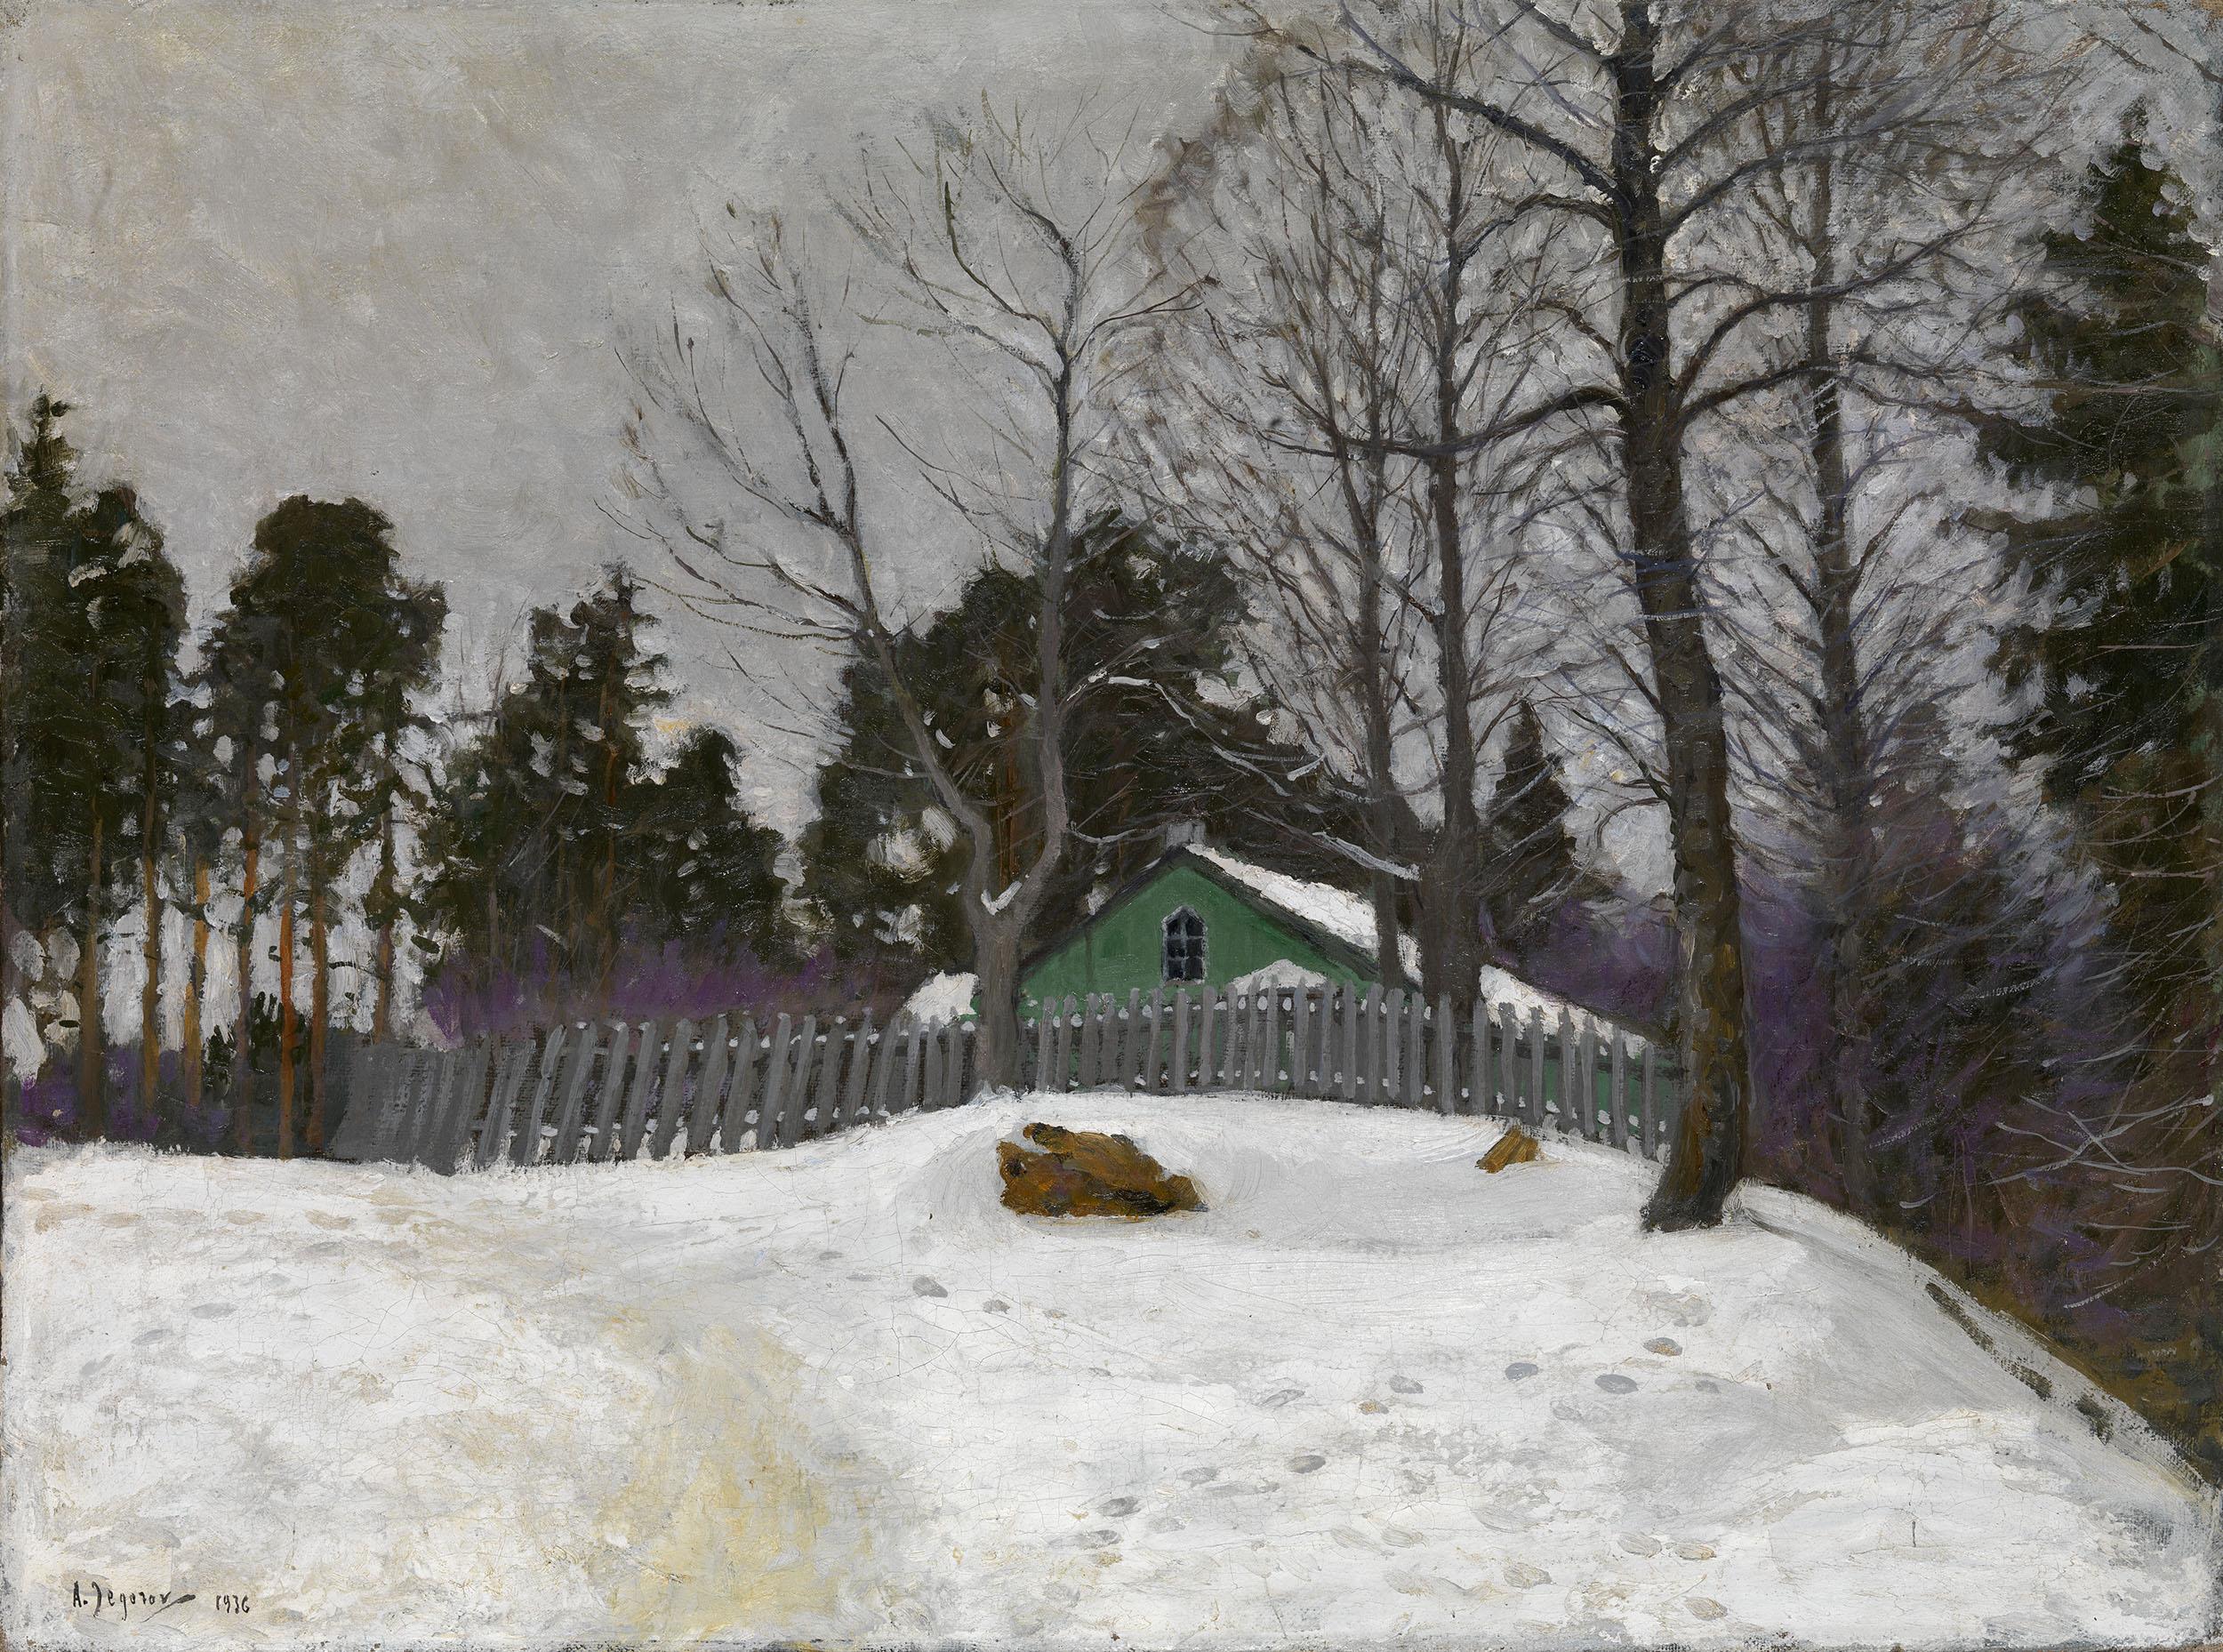 EGOROV, ANDREI Winter Landscape